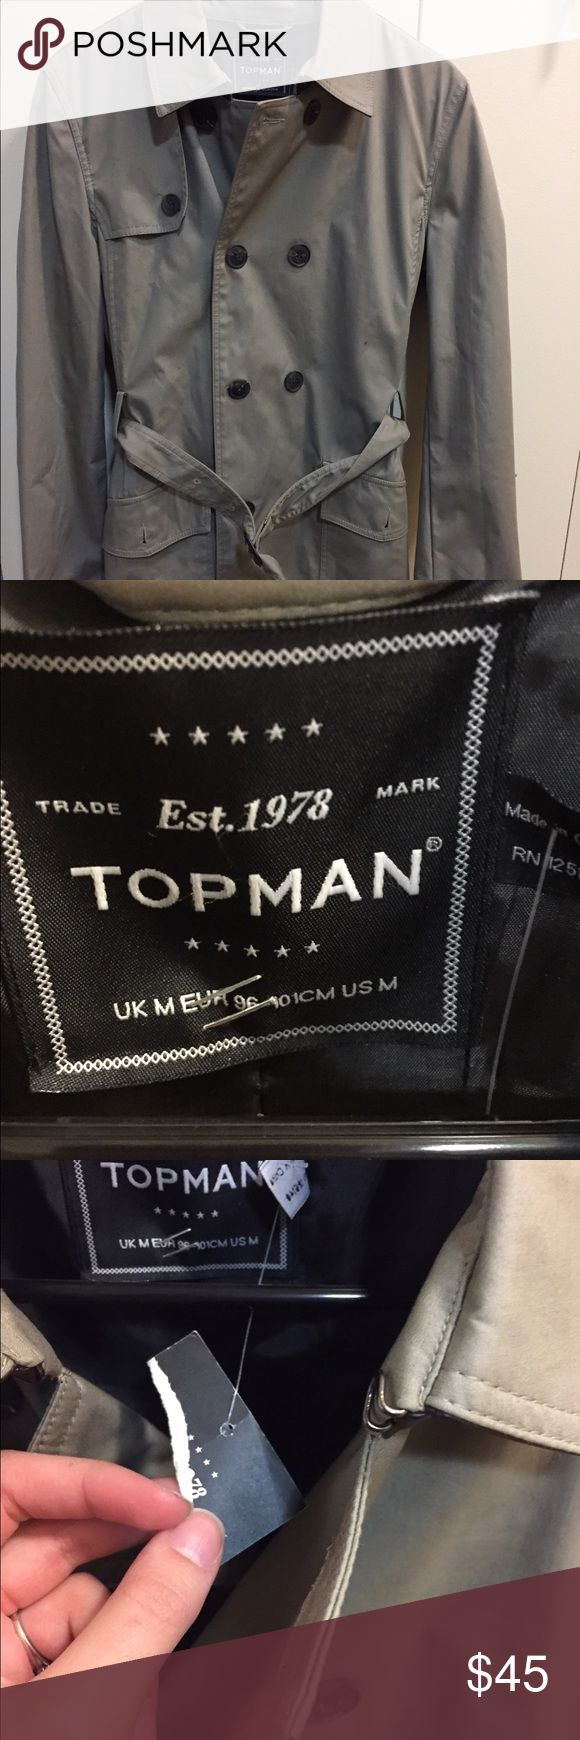 Topman trenchcoat NWT . Topman Jackets & Coats Trench Coats